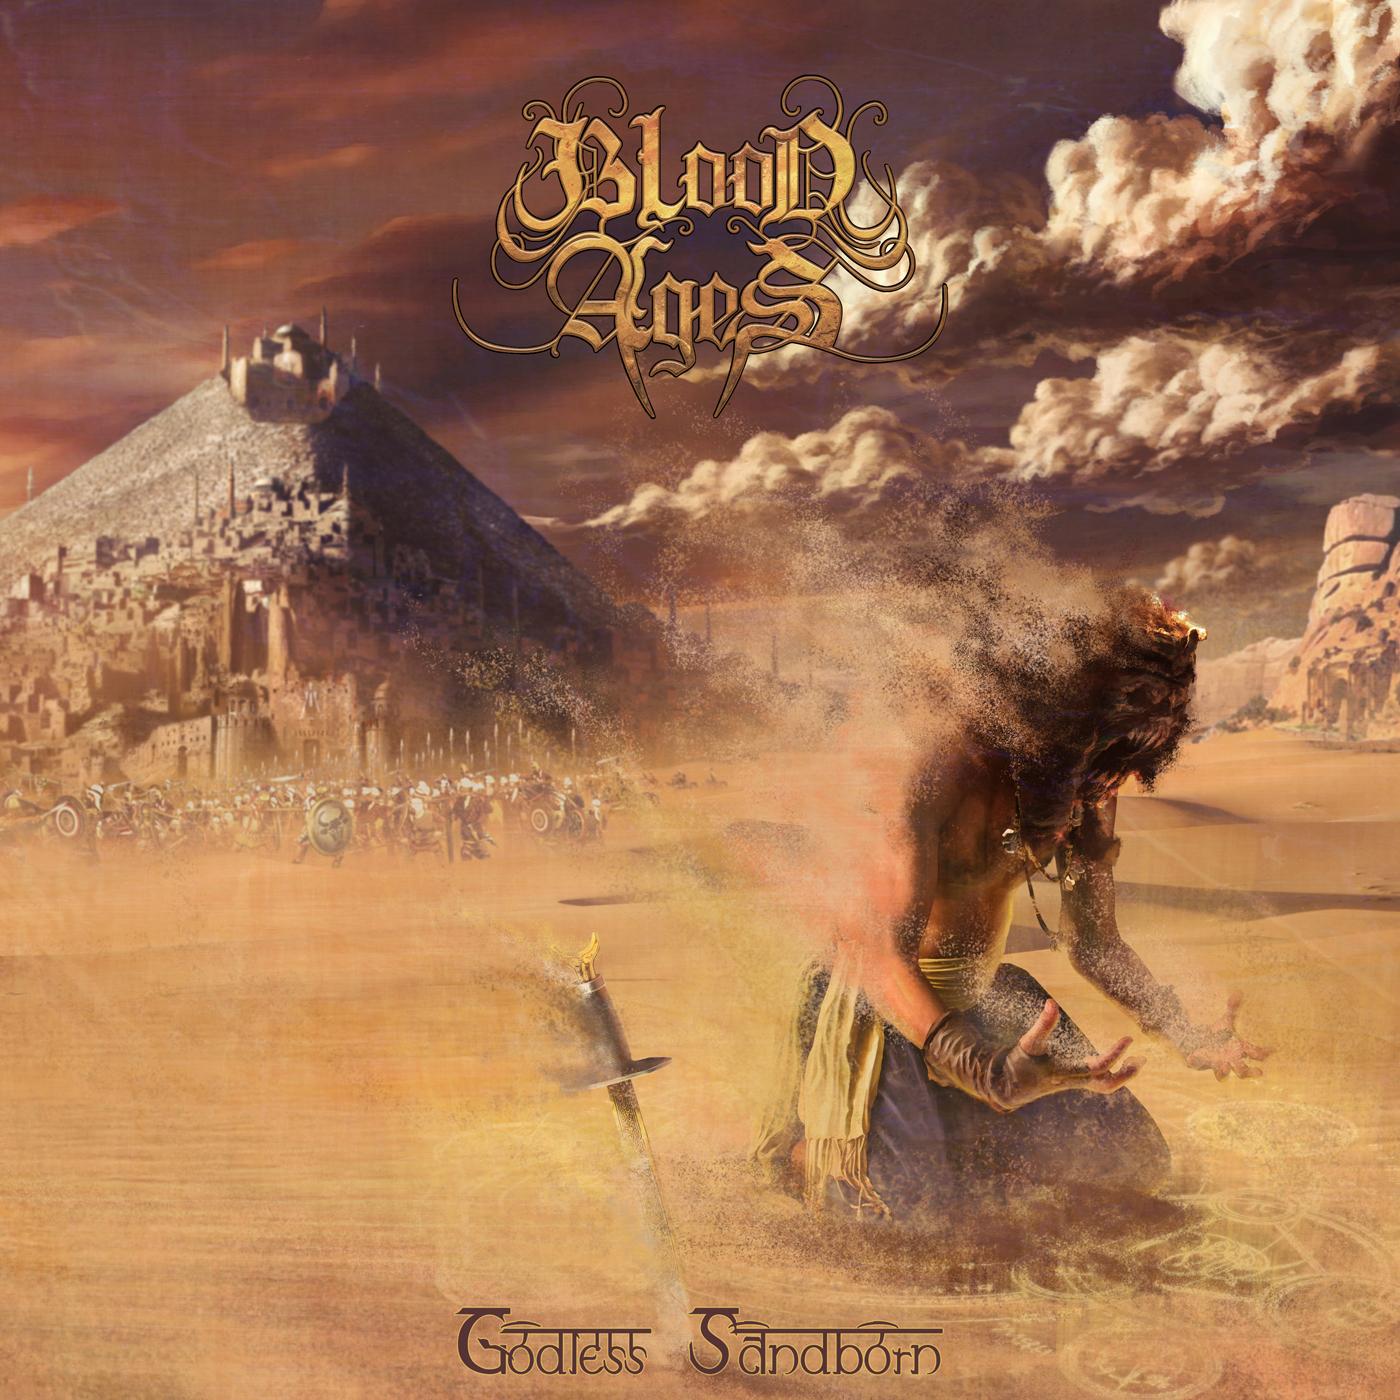 Blood Ages – Godless Sandborn CD Review